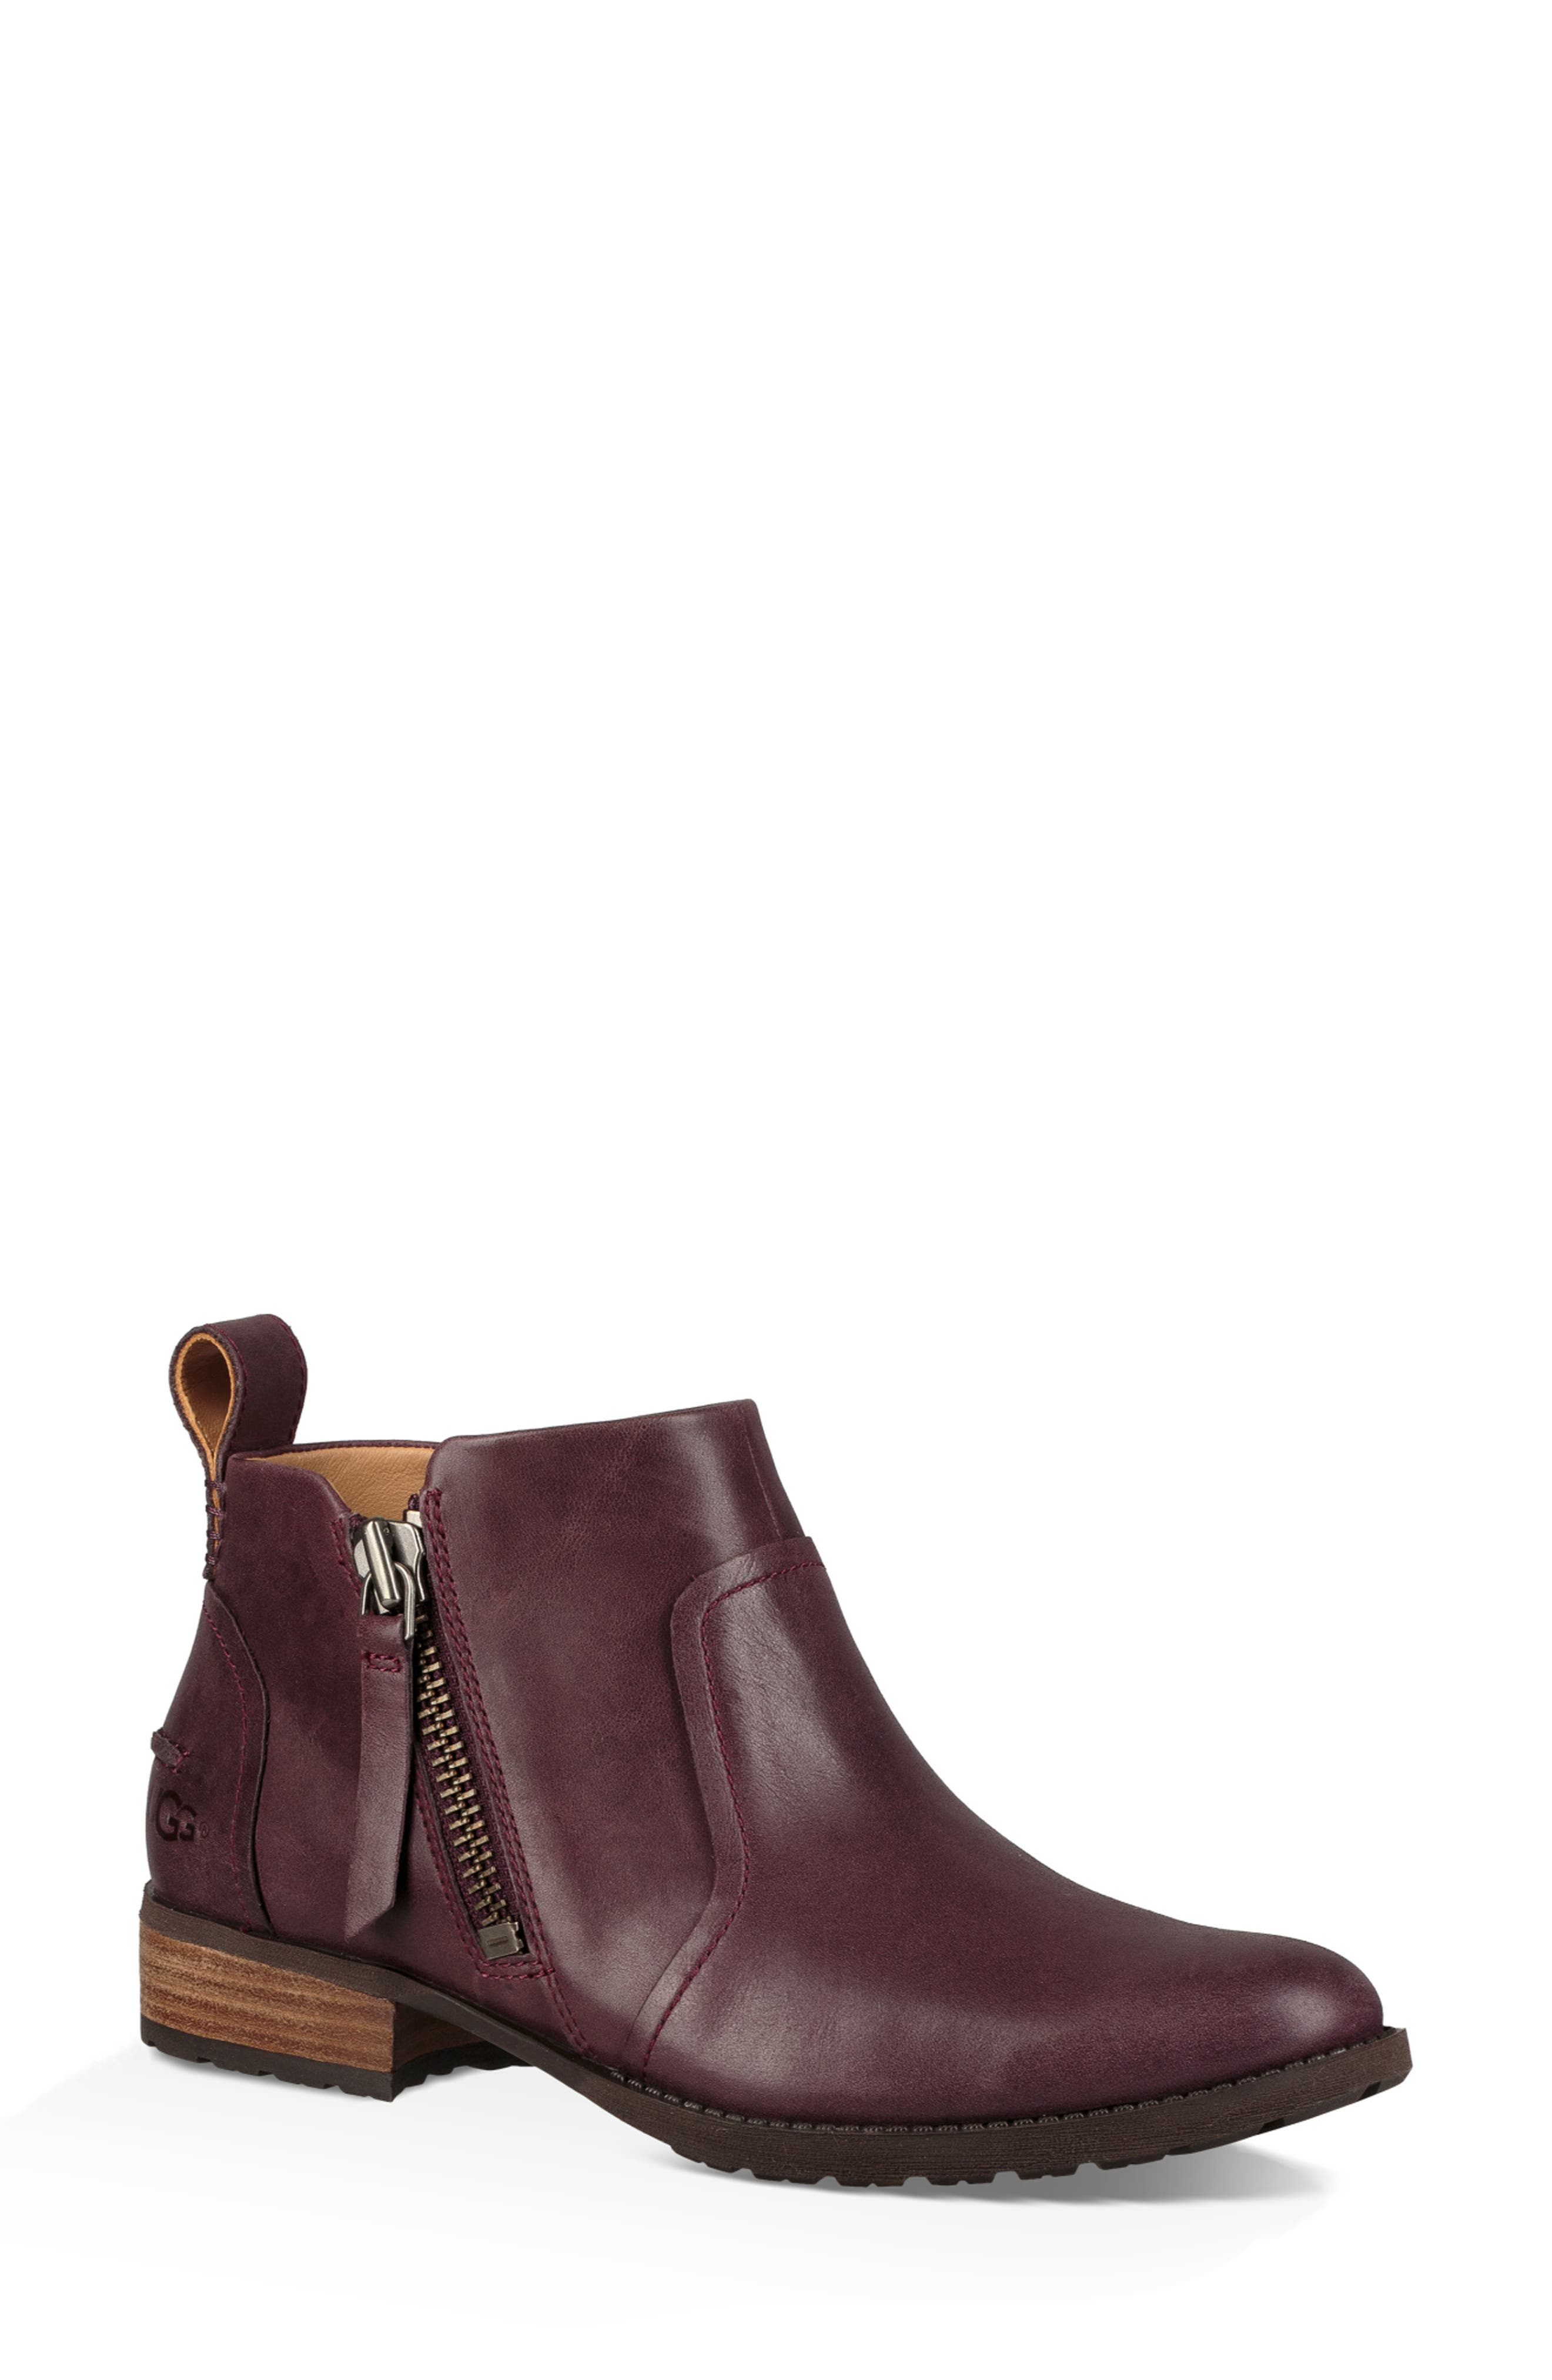 Aureo Bootie,                         Main,                         color, Oxblood Leather